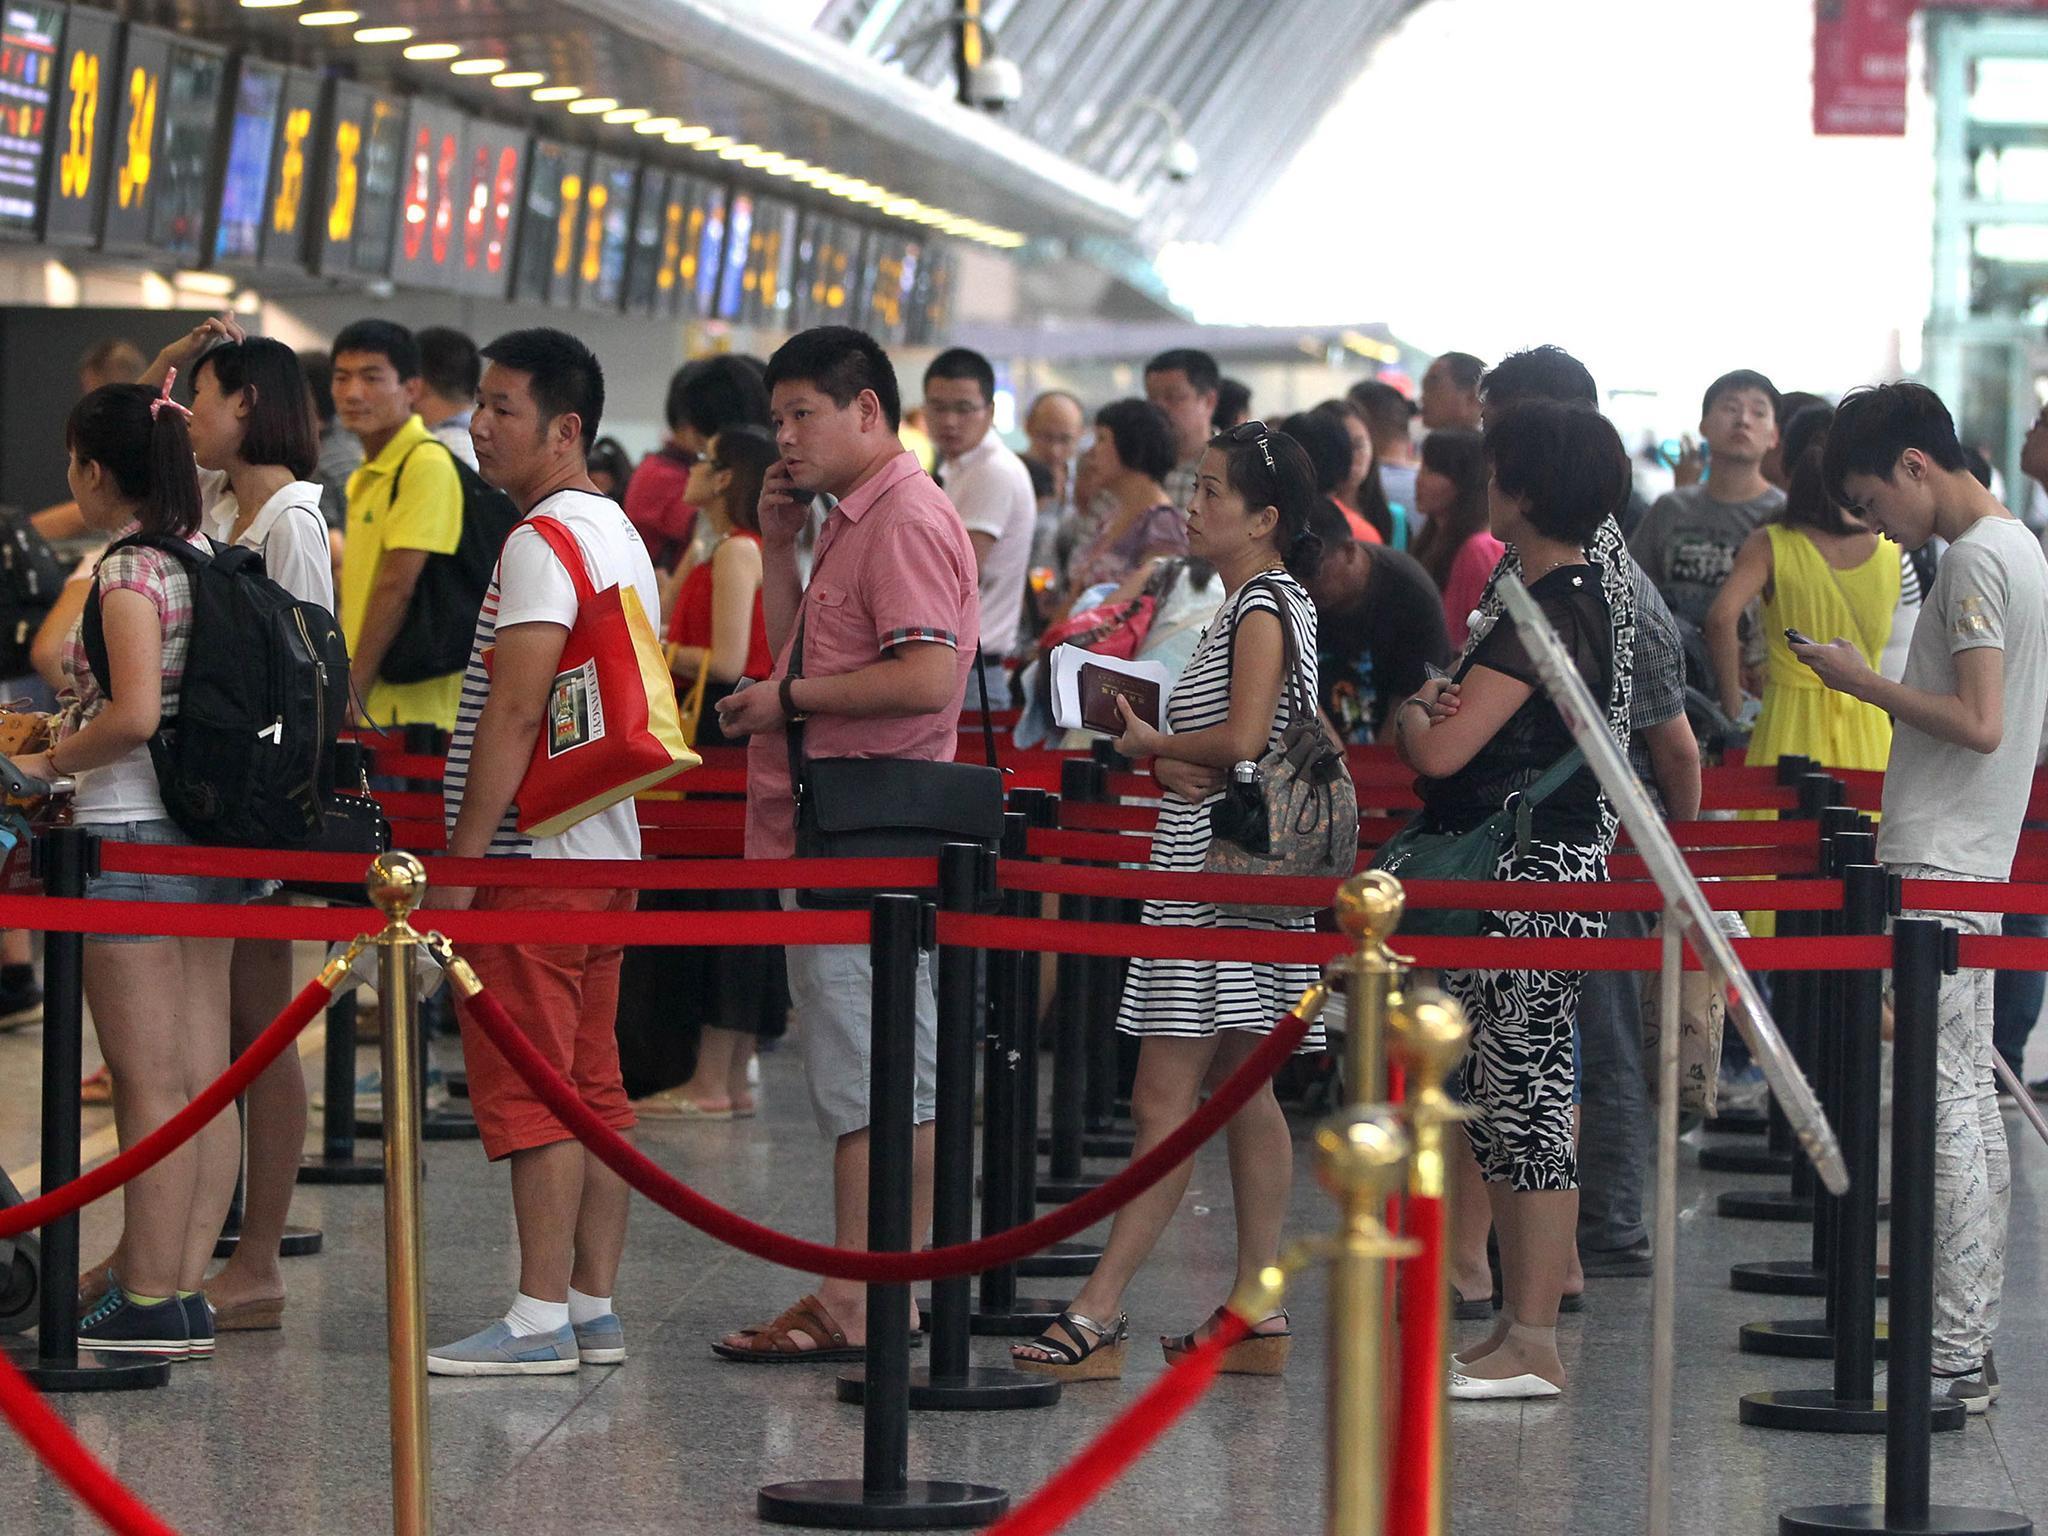 UPDATE China readies bad social credit punishments